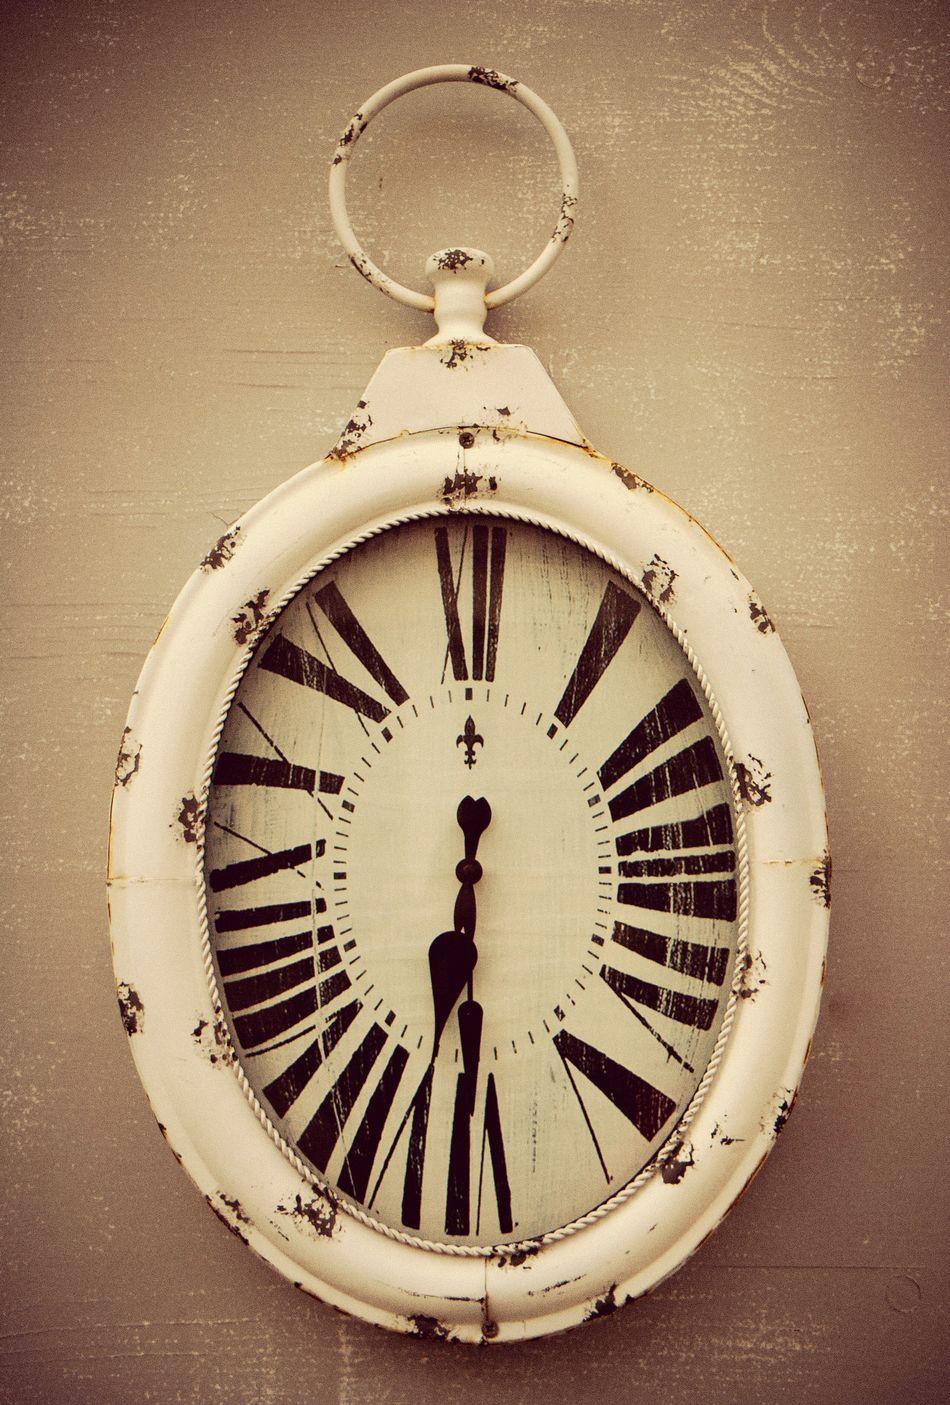 Clock Clockwise Clock On The Wall Clock Hands Clocks At Street Clock